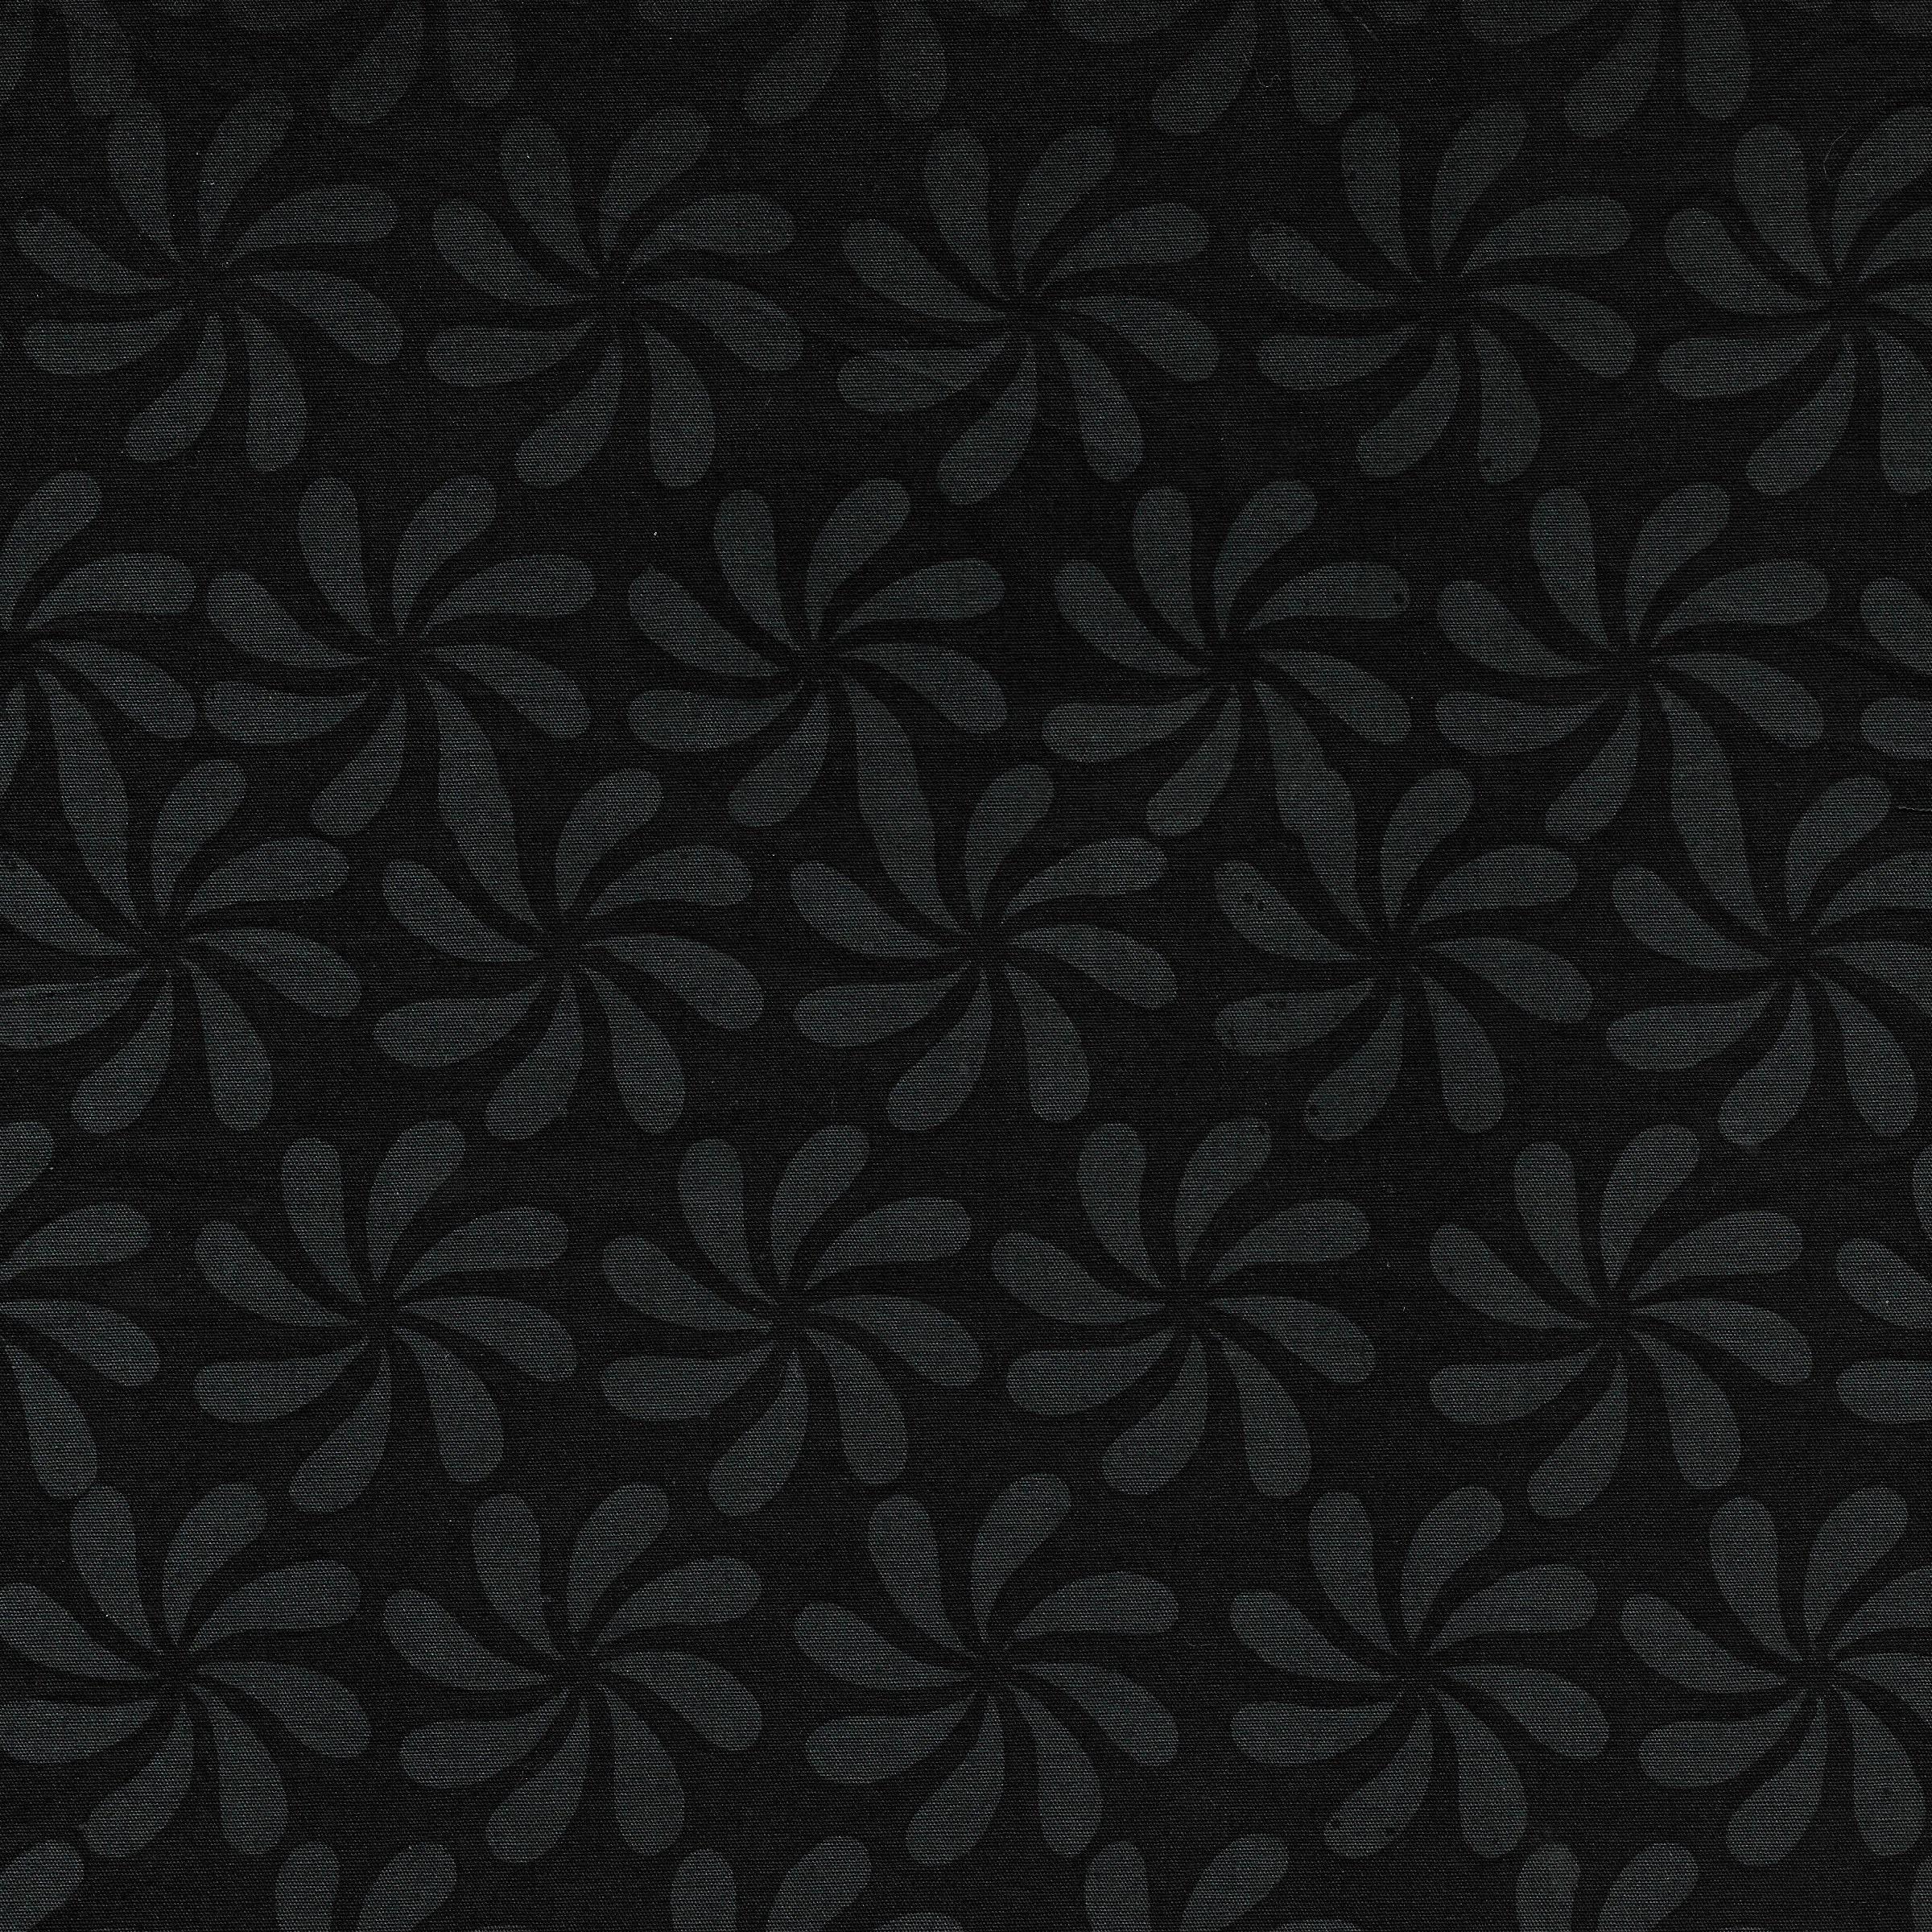 Island Batik-Propeller  111918796